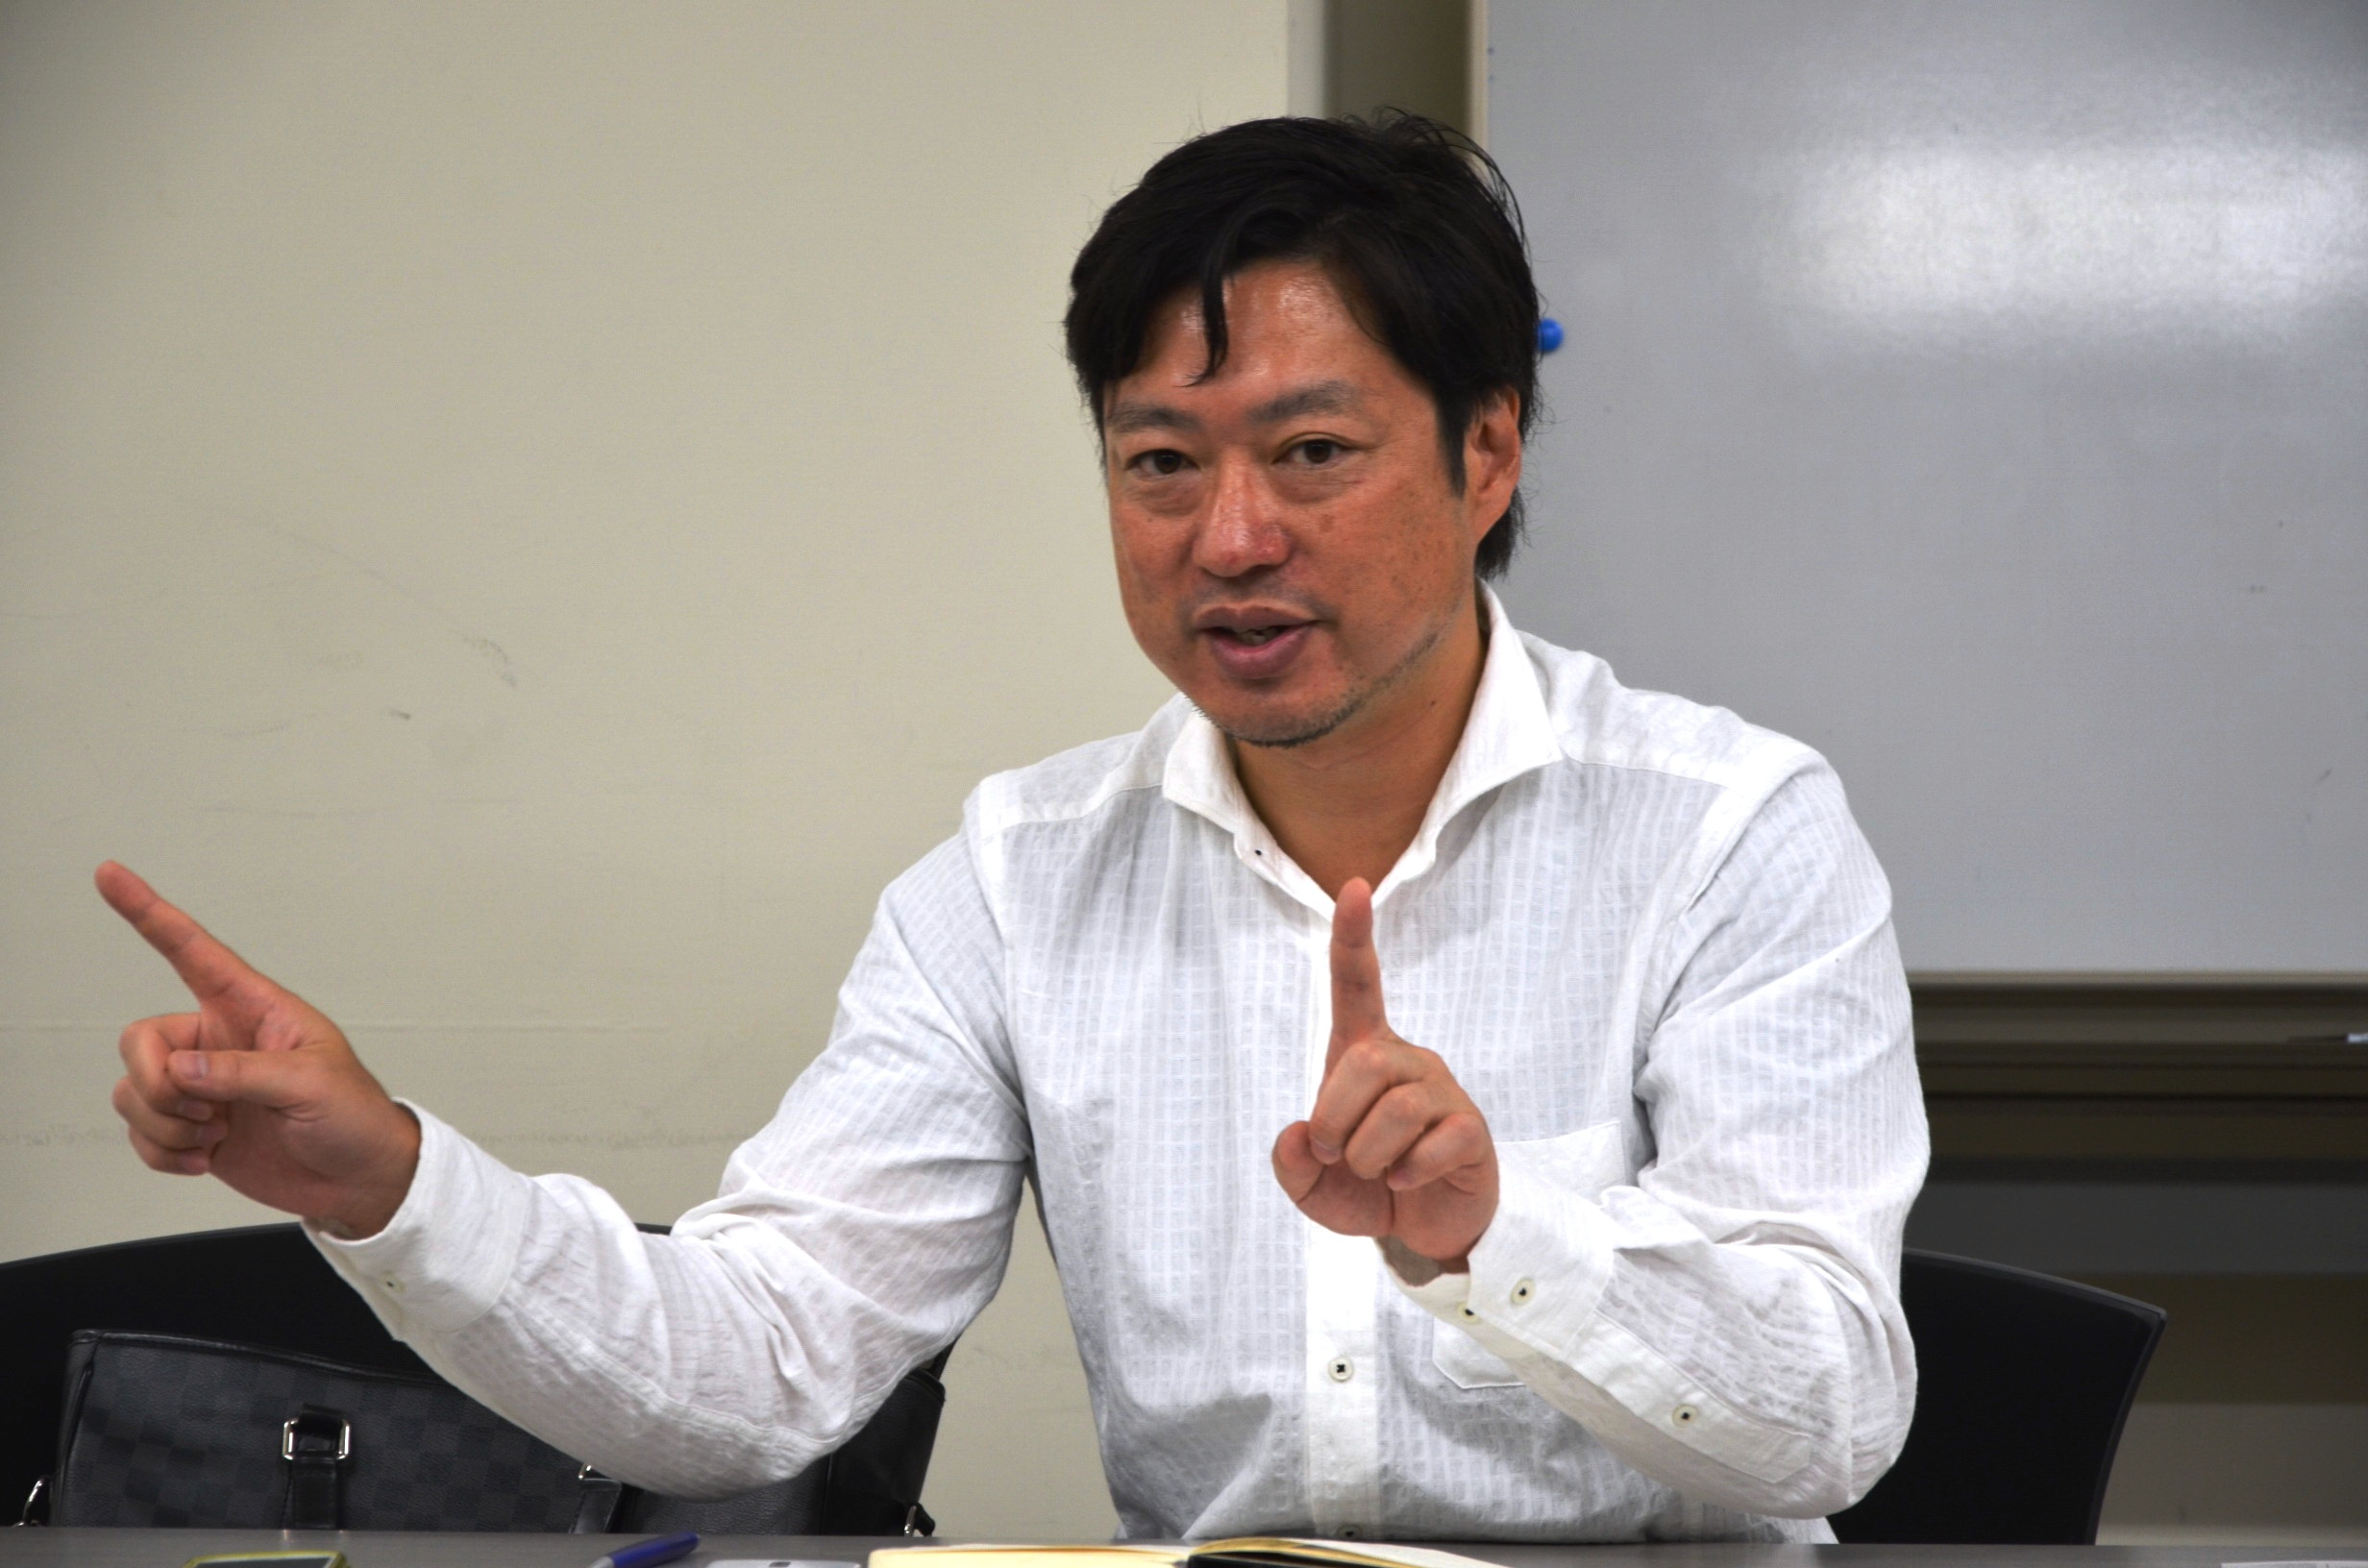 Japan wants to build maritime security capacity for Vietnam: scholar